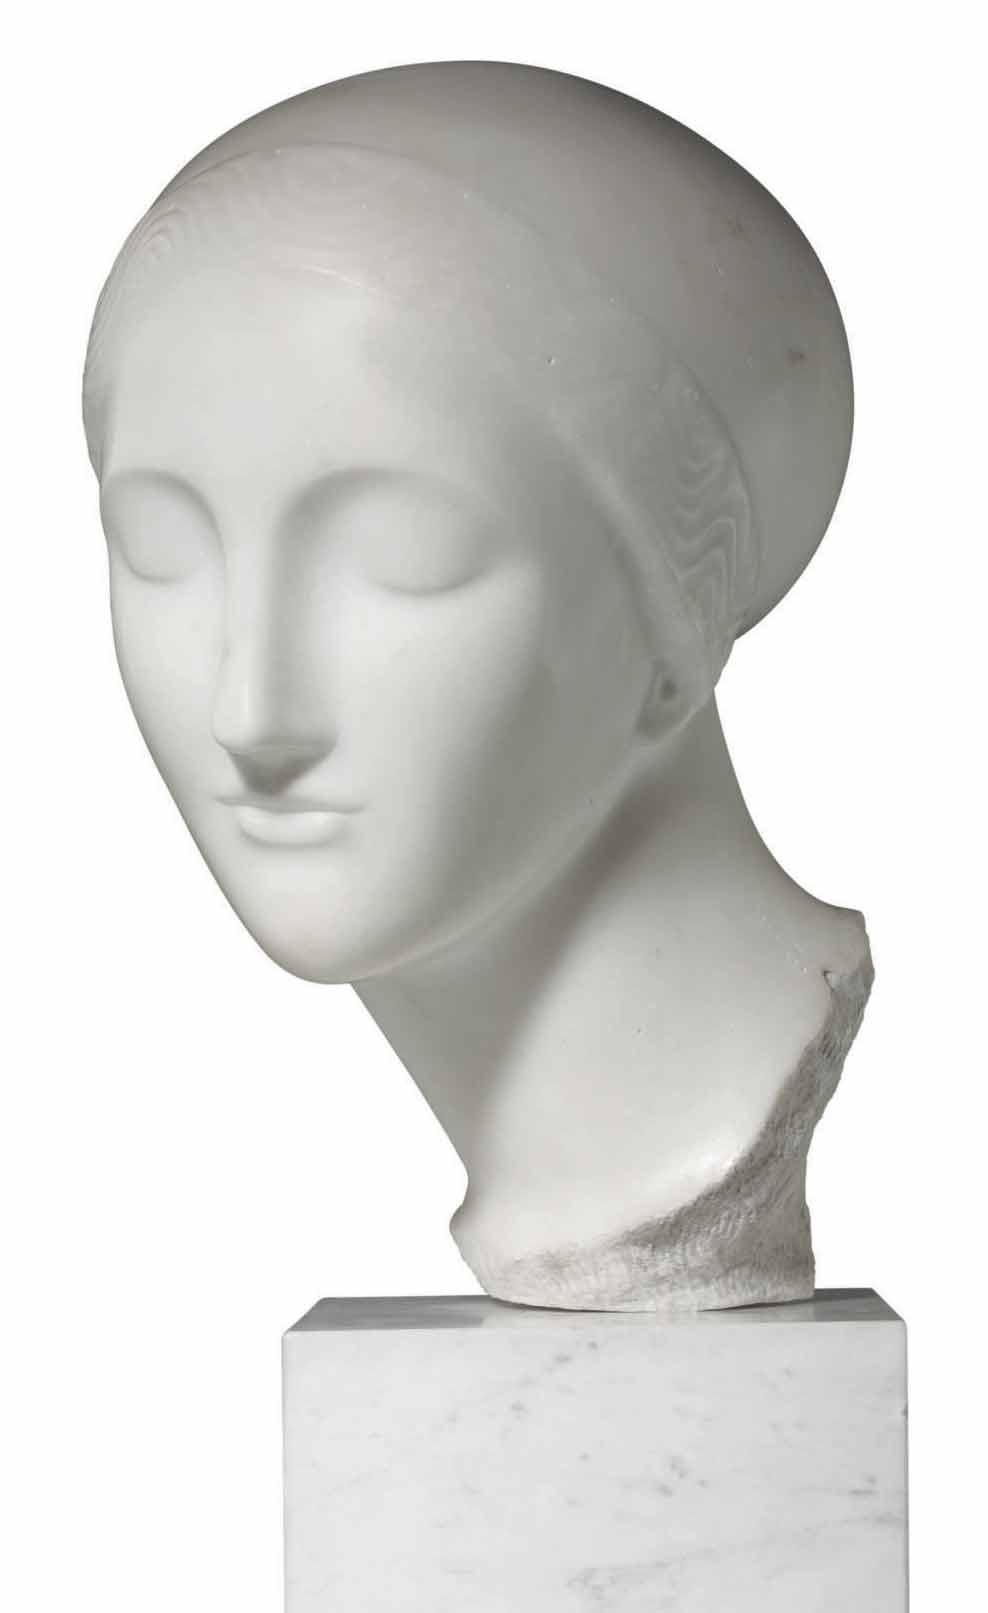 Early Ideal Head (La Mysterieuse)